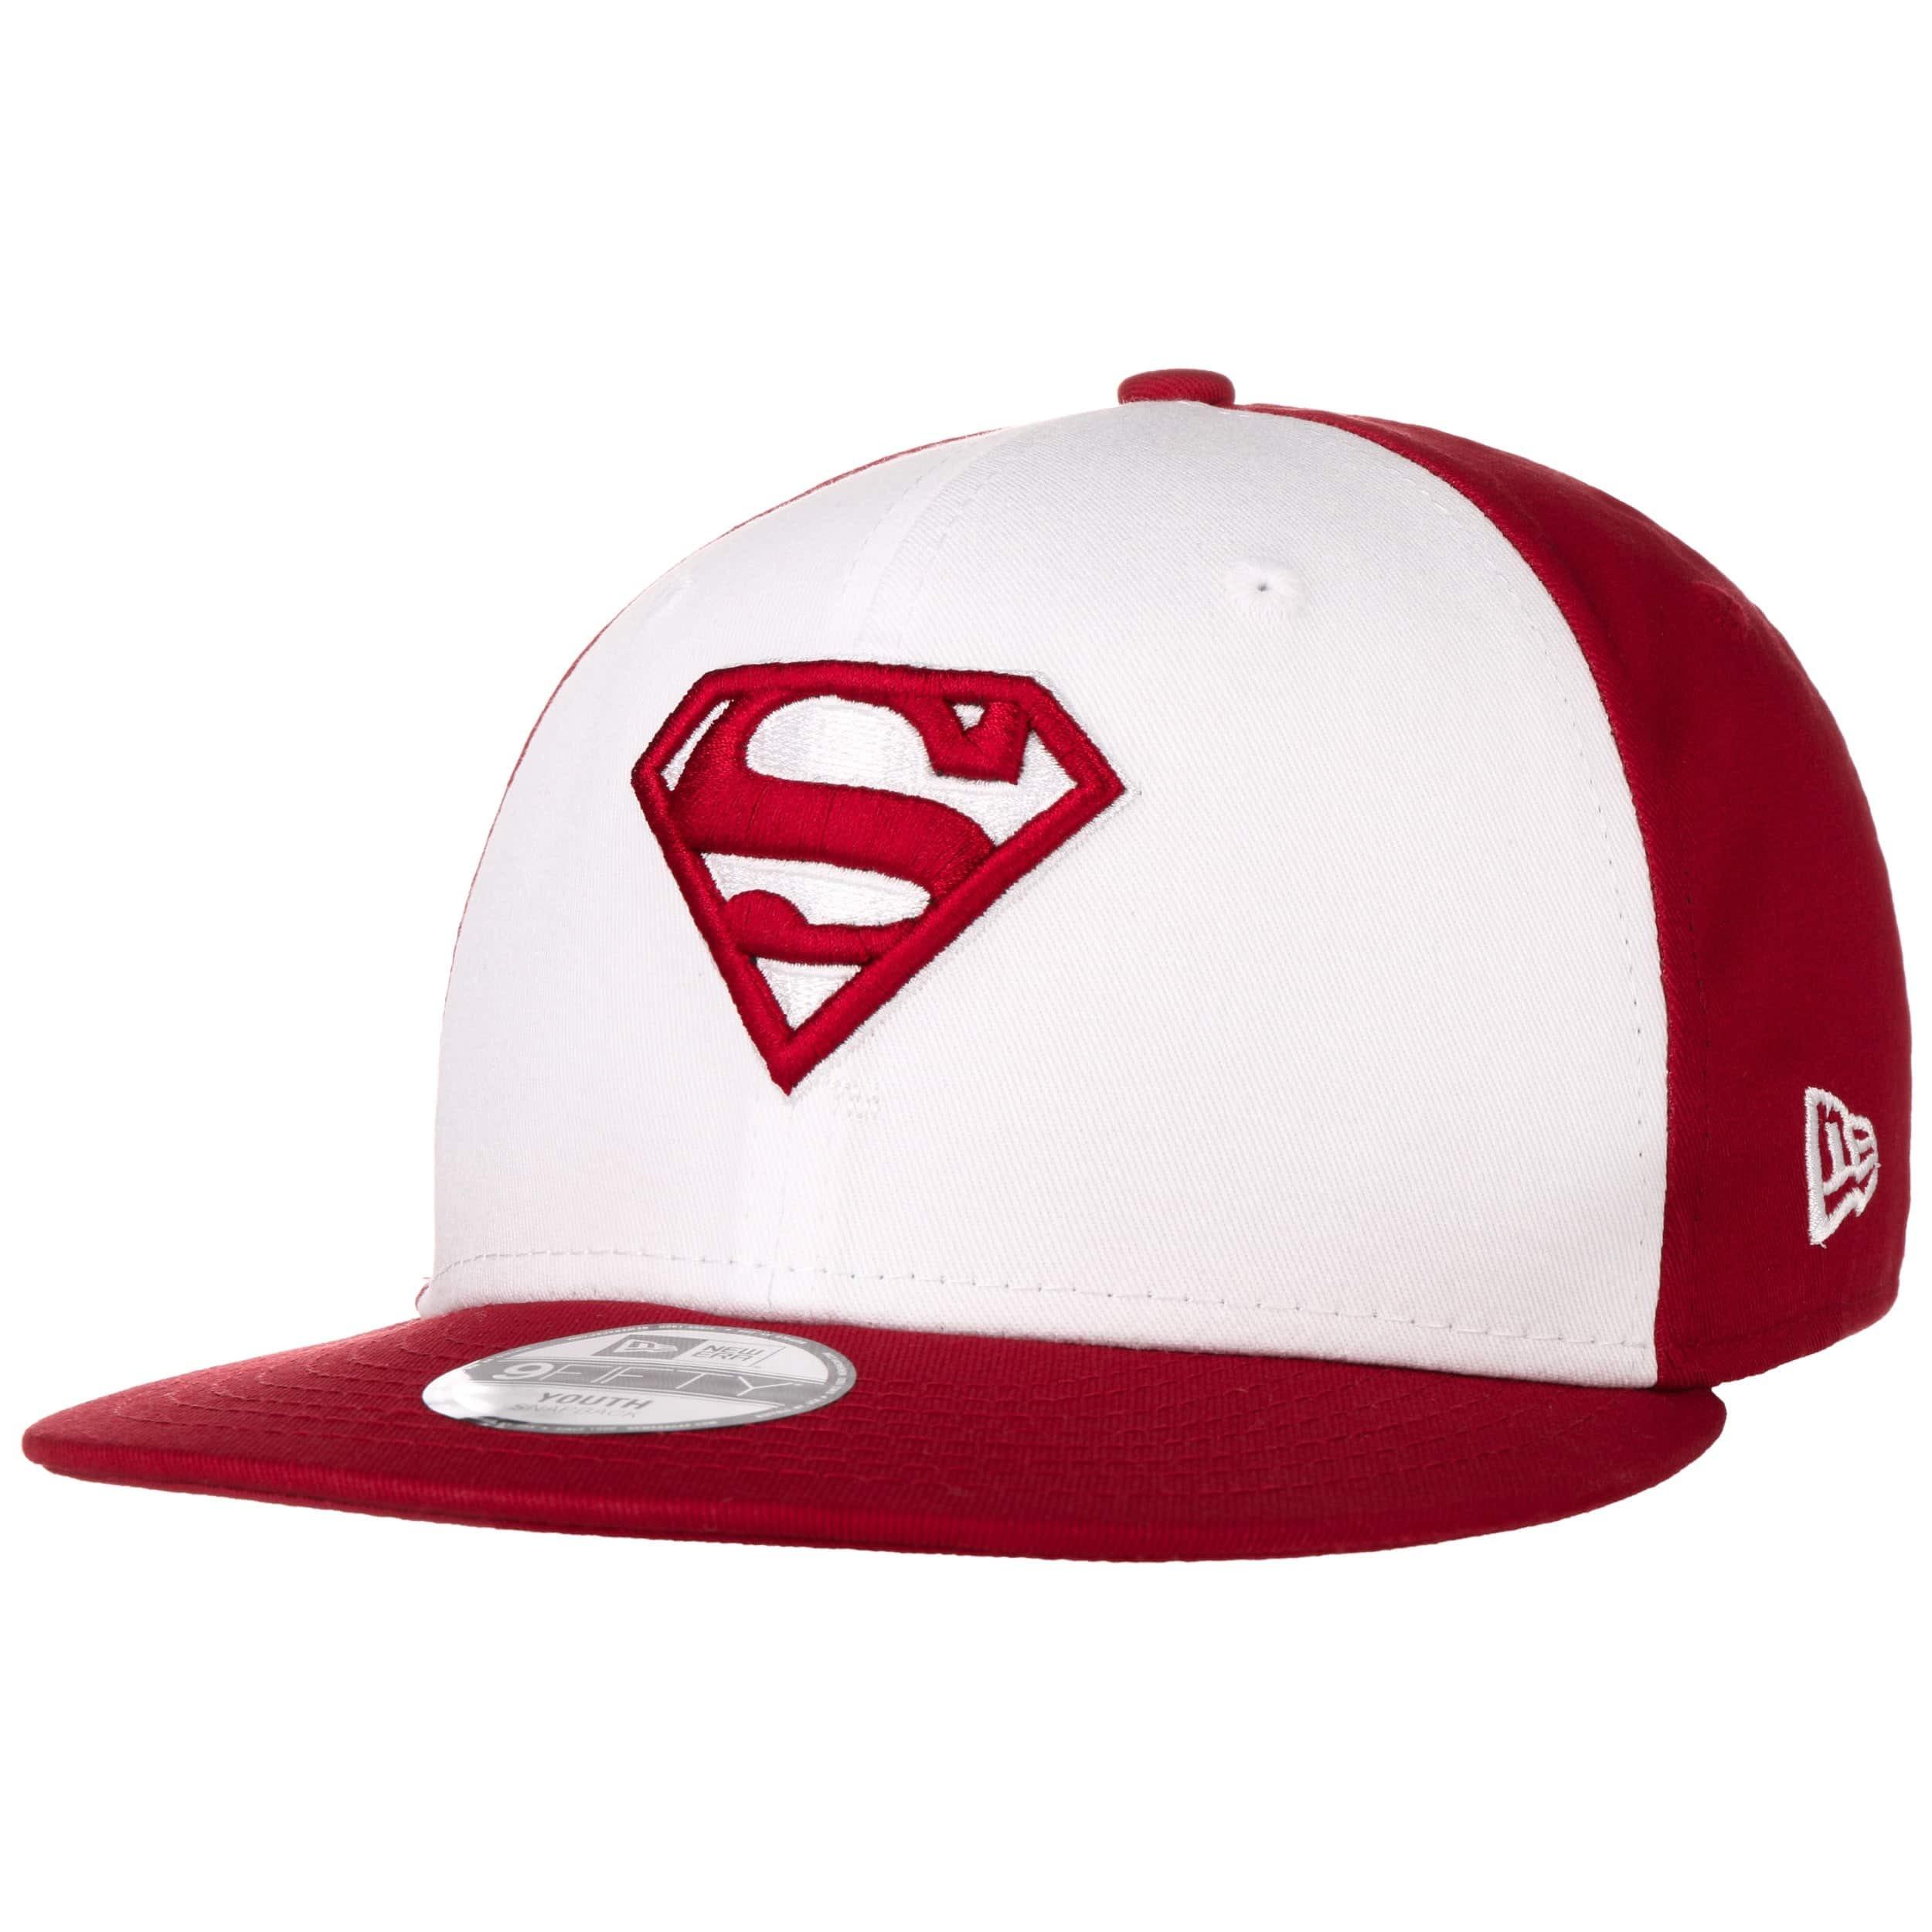 CHARACTER JERSEY SUPERMAN CAP NEW ERA KIDS 9FORTY